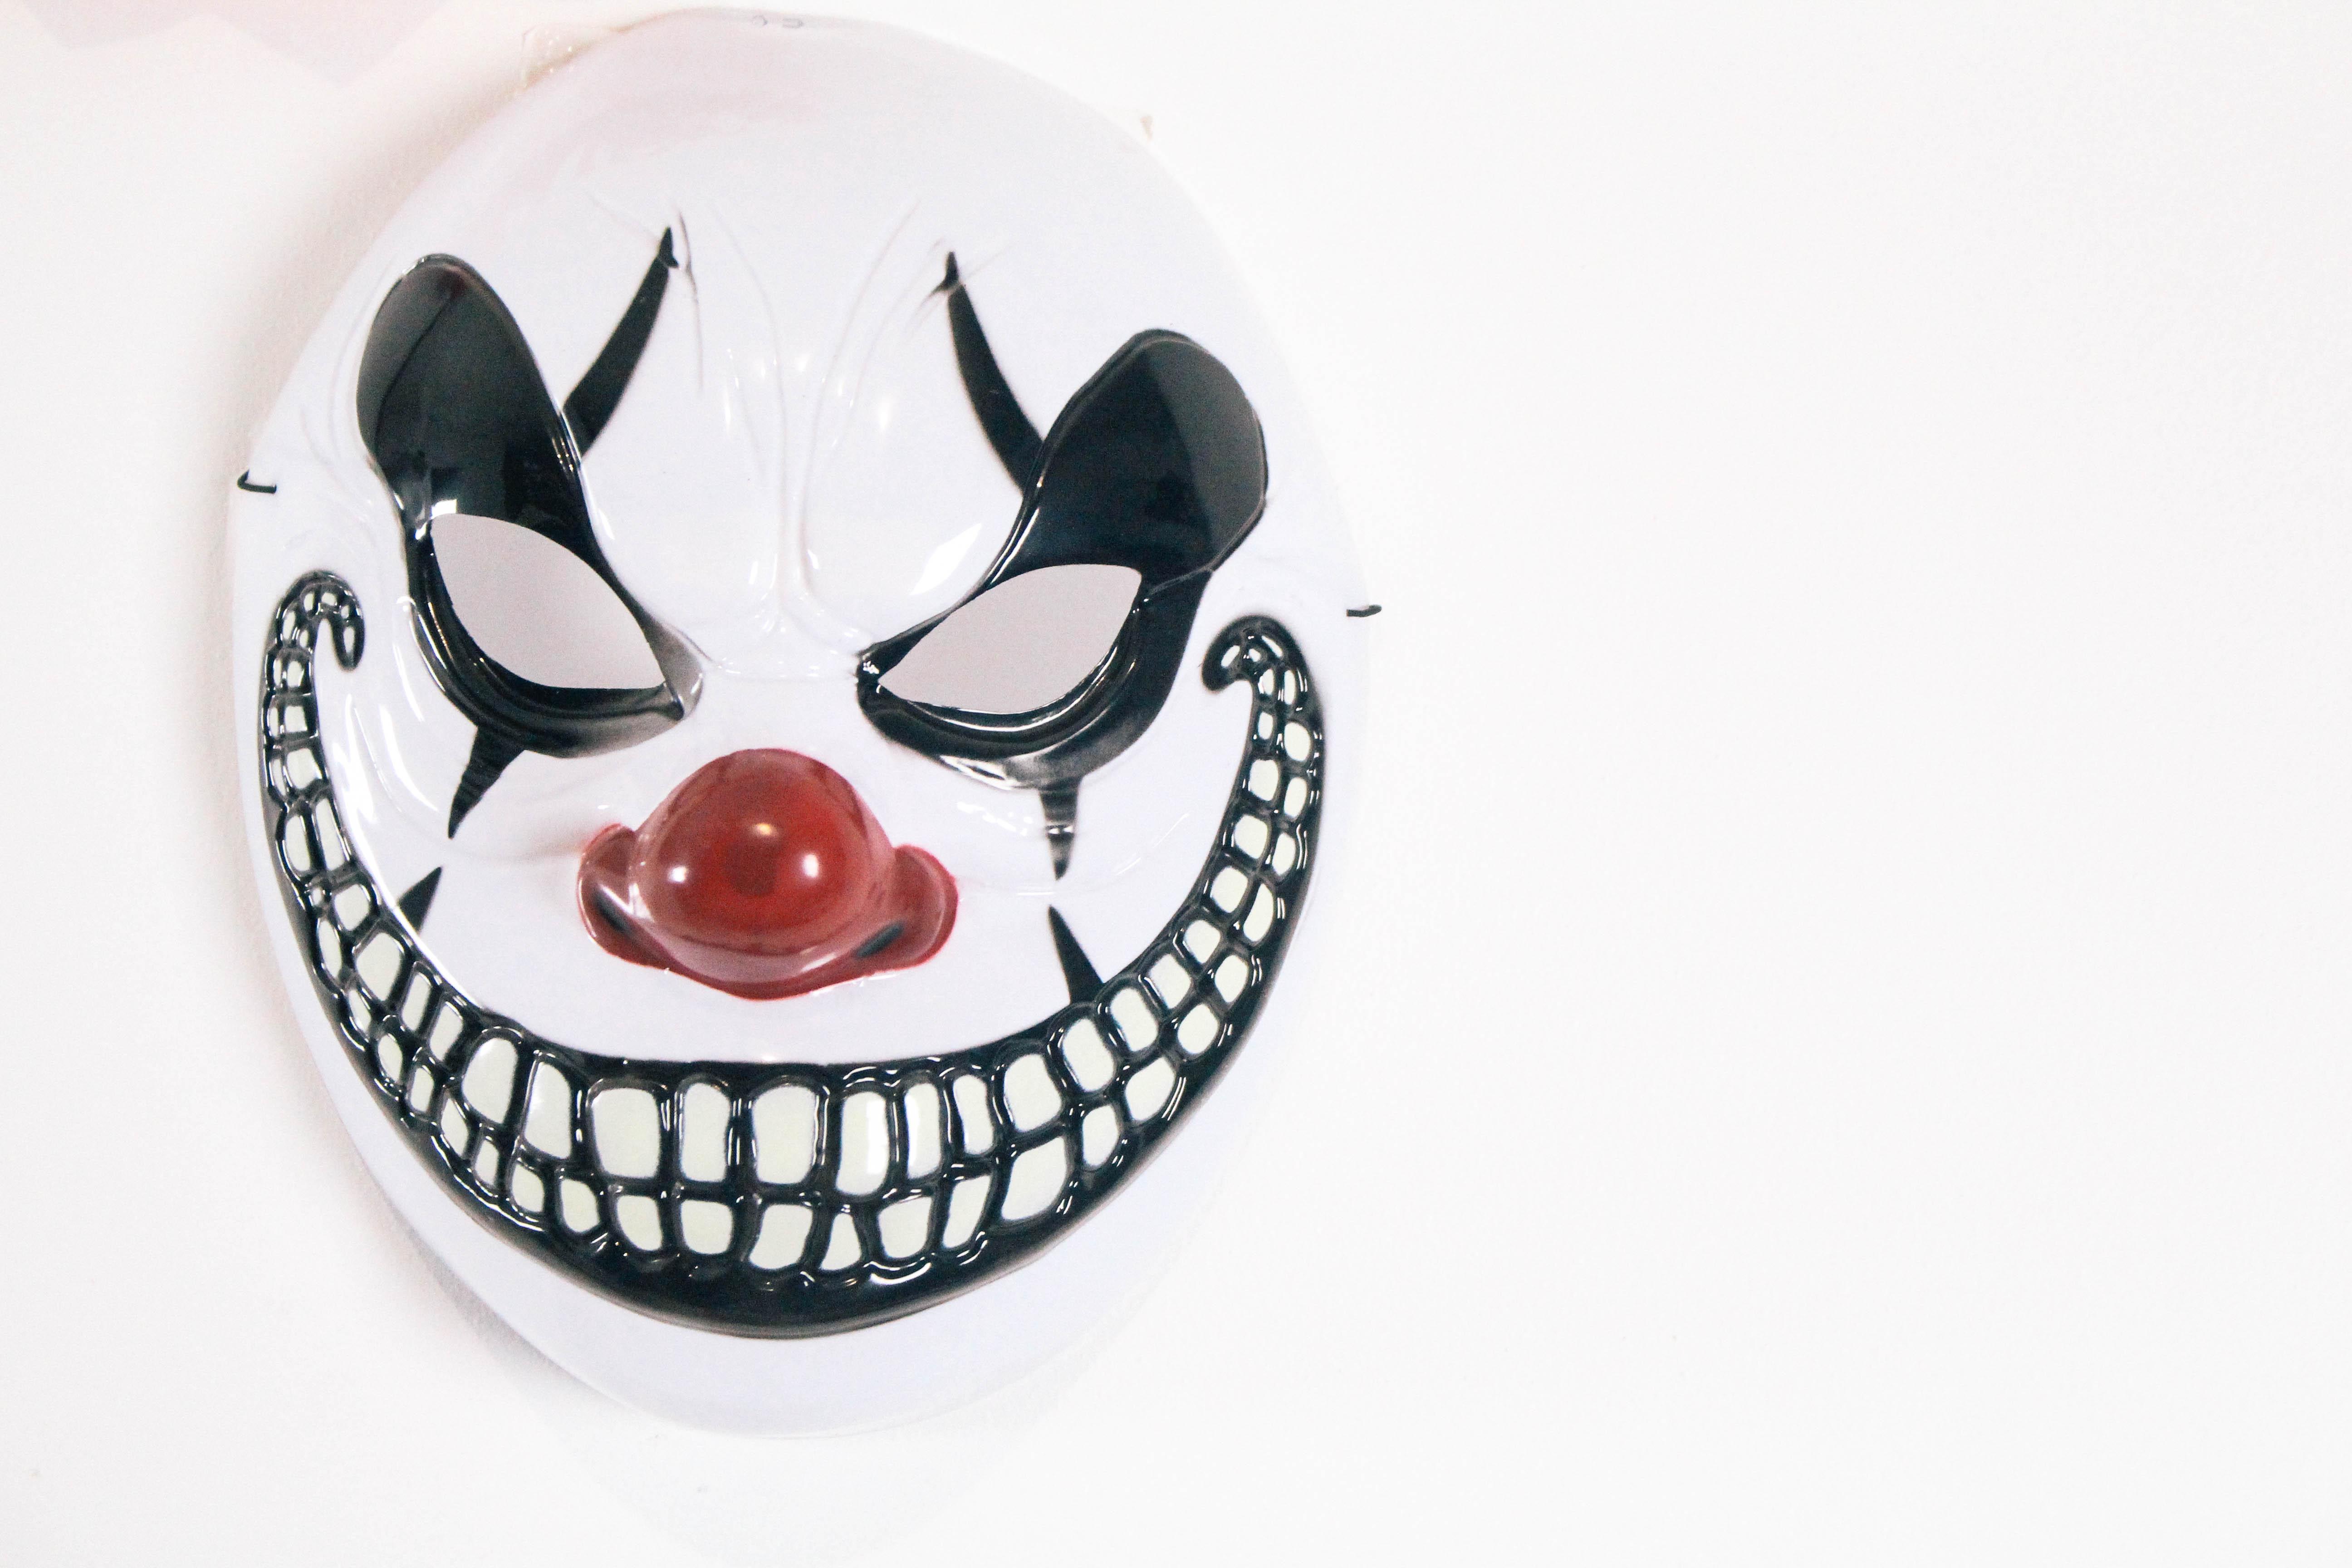 Halloween-Carnival-CarnEVIL-themed-party-tablescape-creepy-clown-mask-1